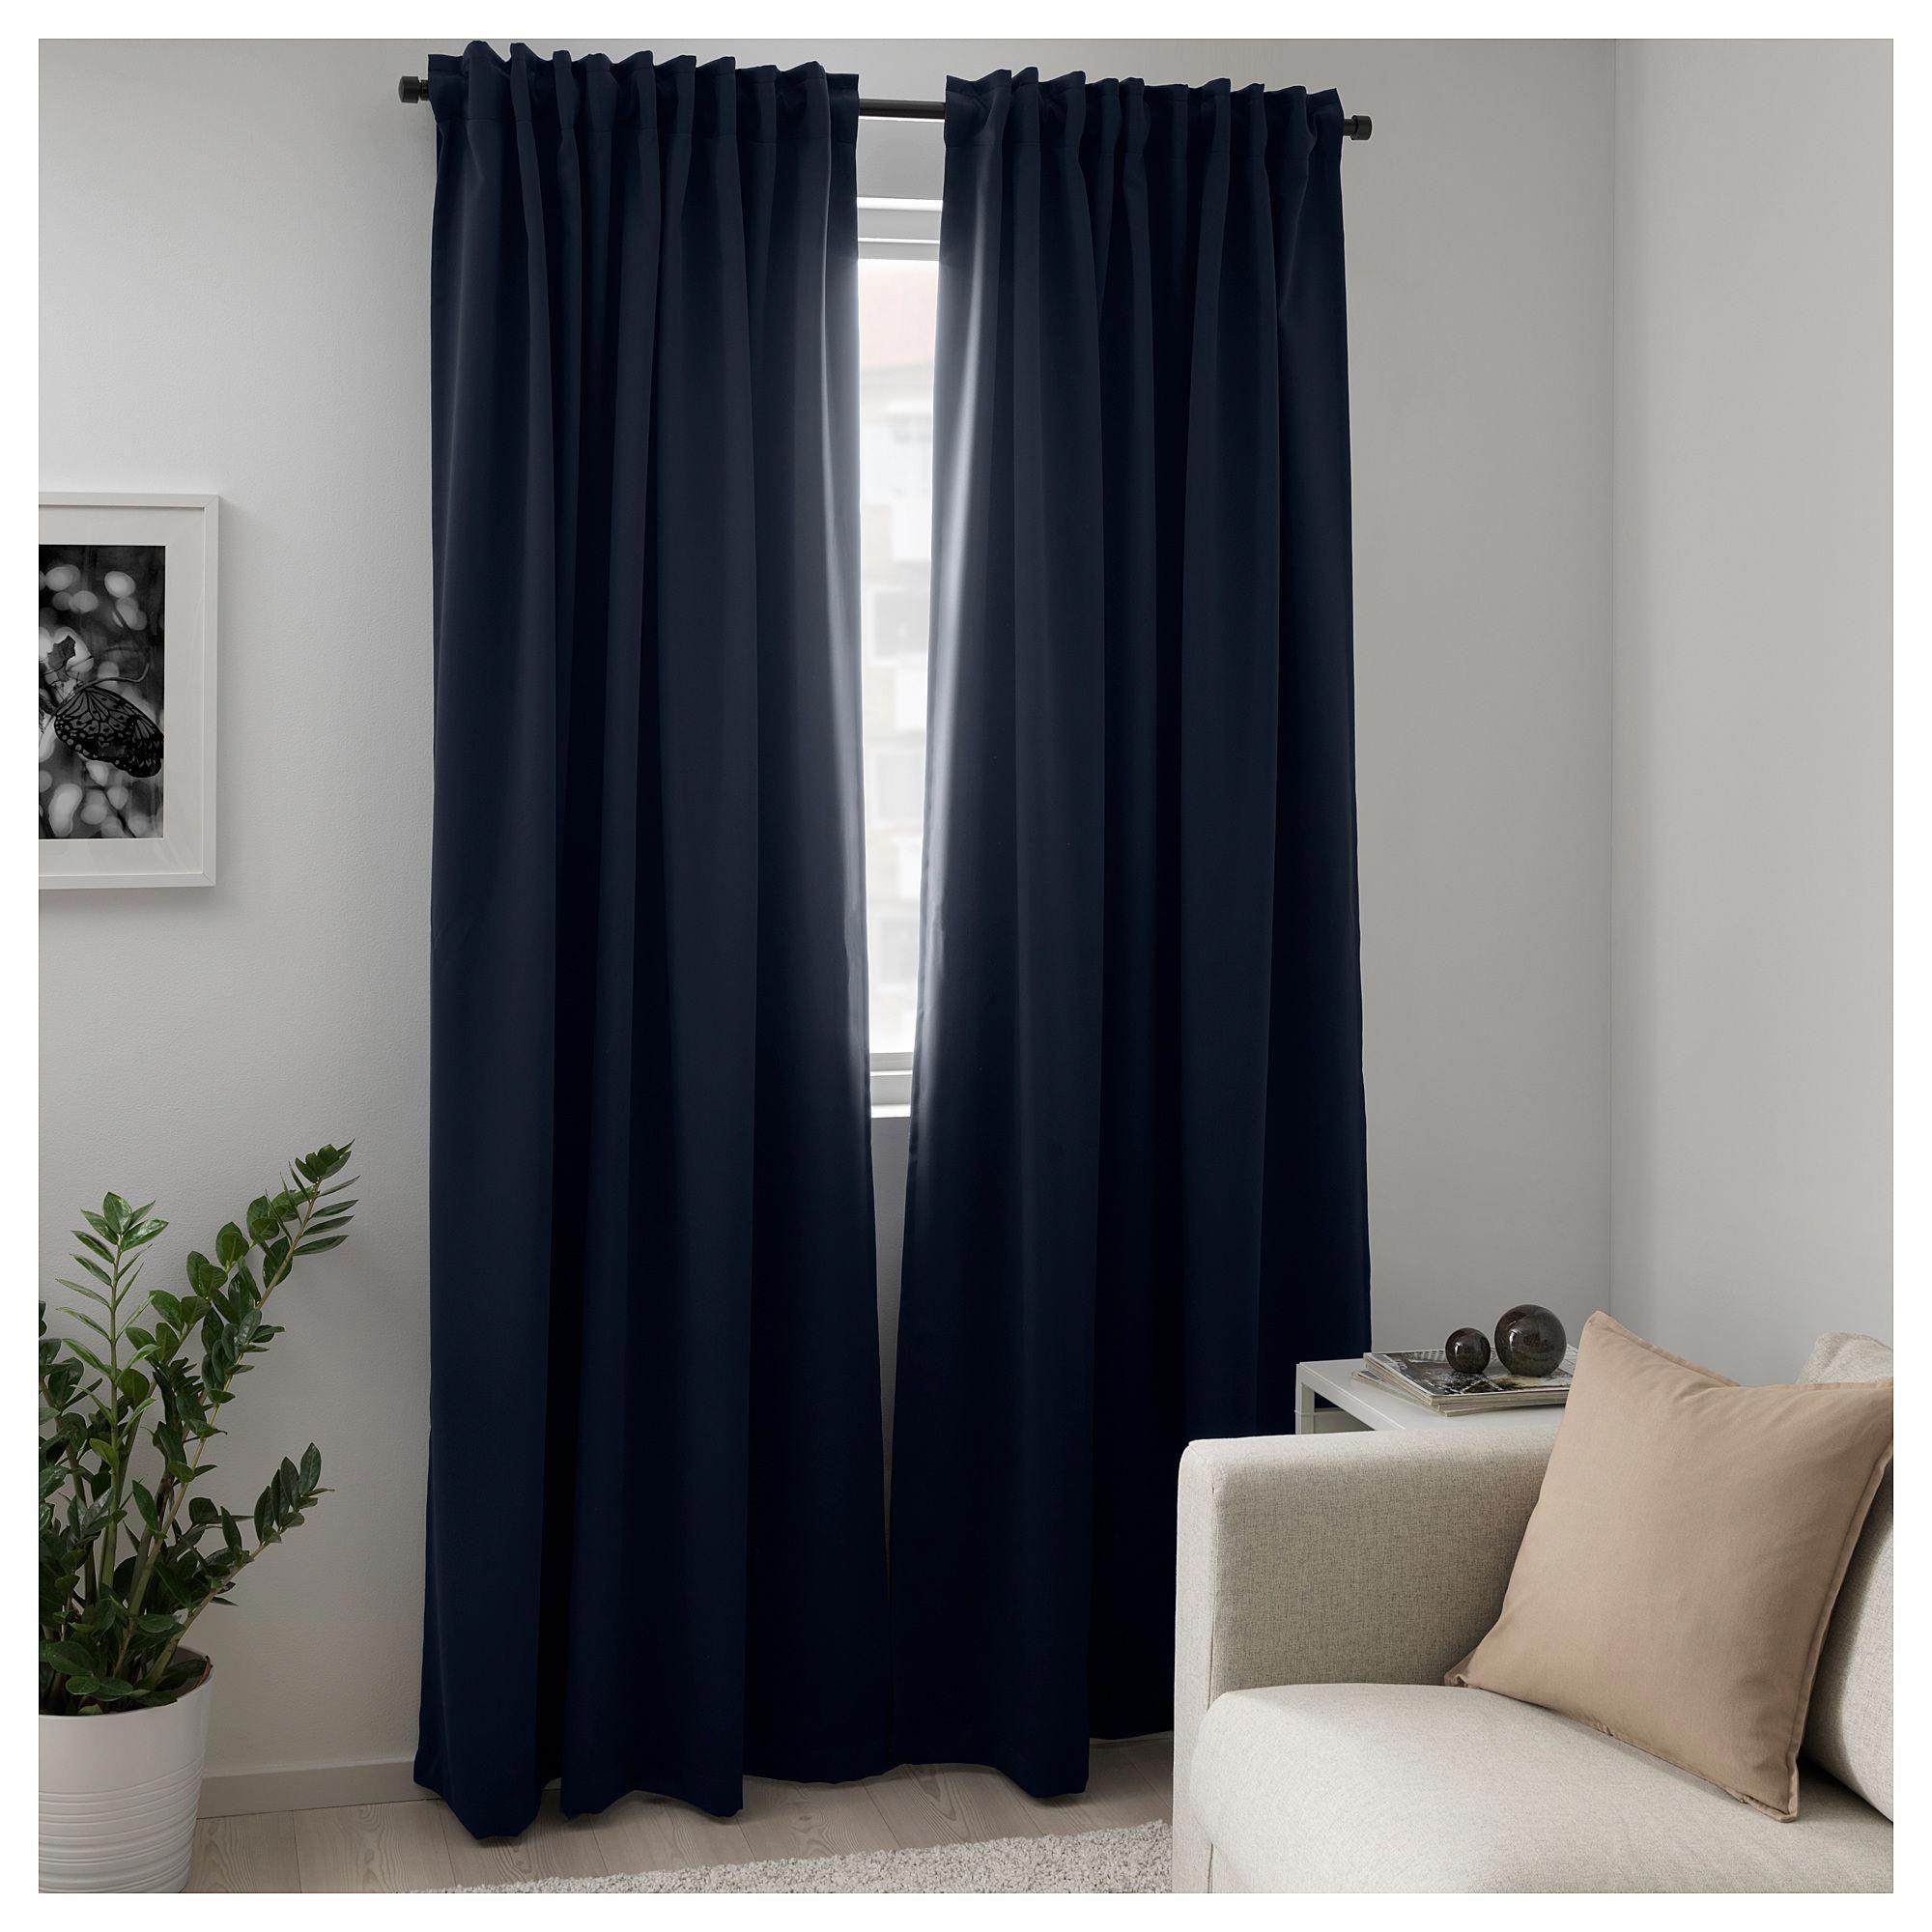 Ikea Majgull Blackout Curtains 1 Pair Dark Blue